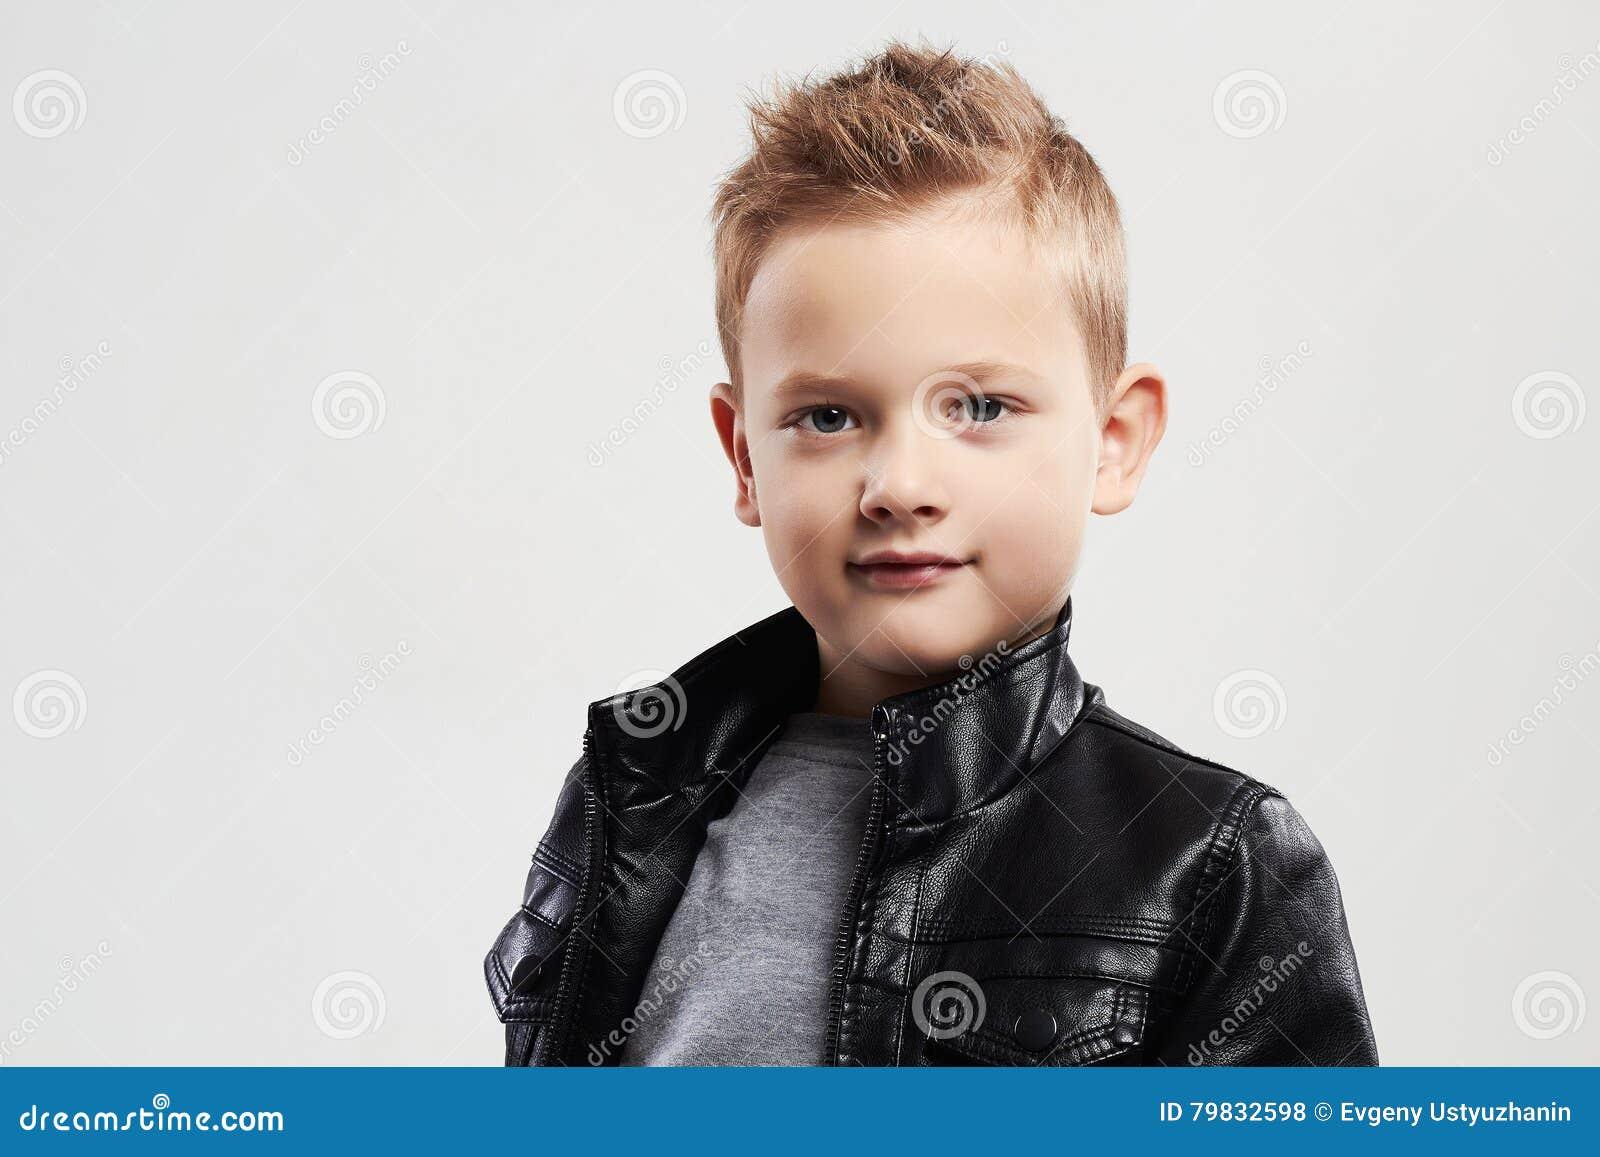 Fashionable Child In Leather Coat Stylish Child With